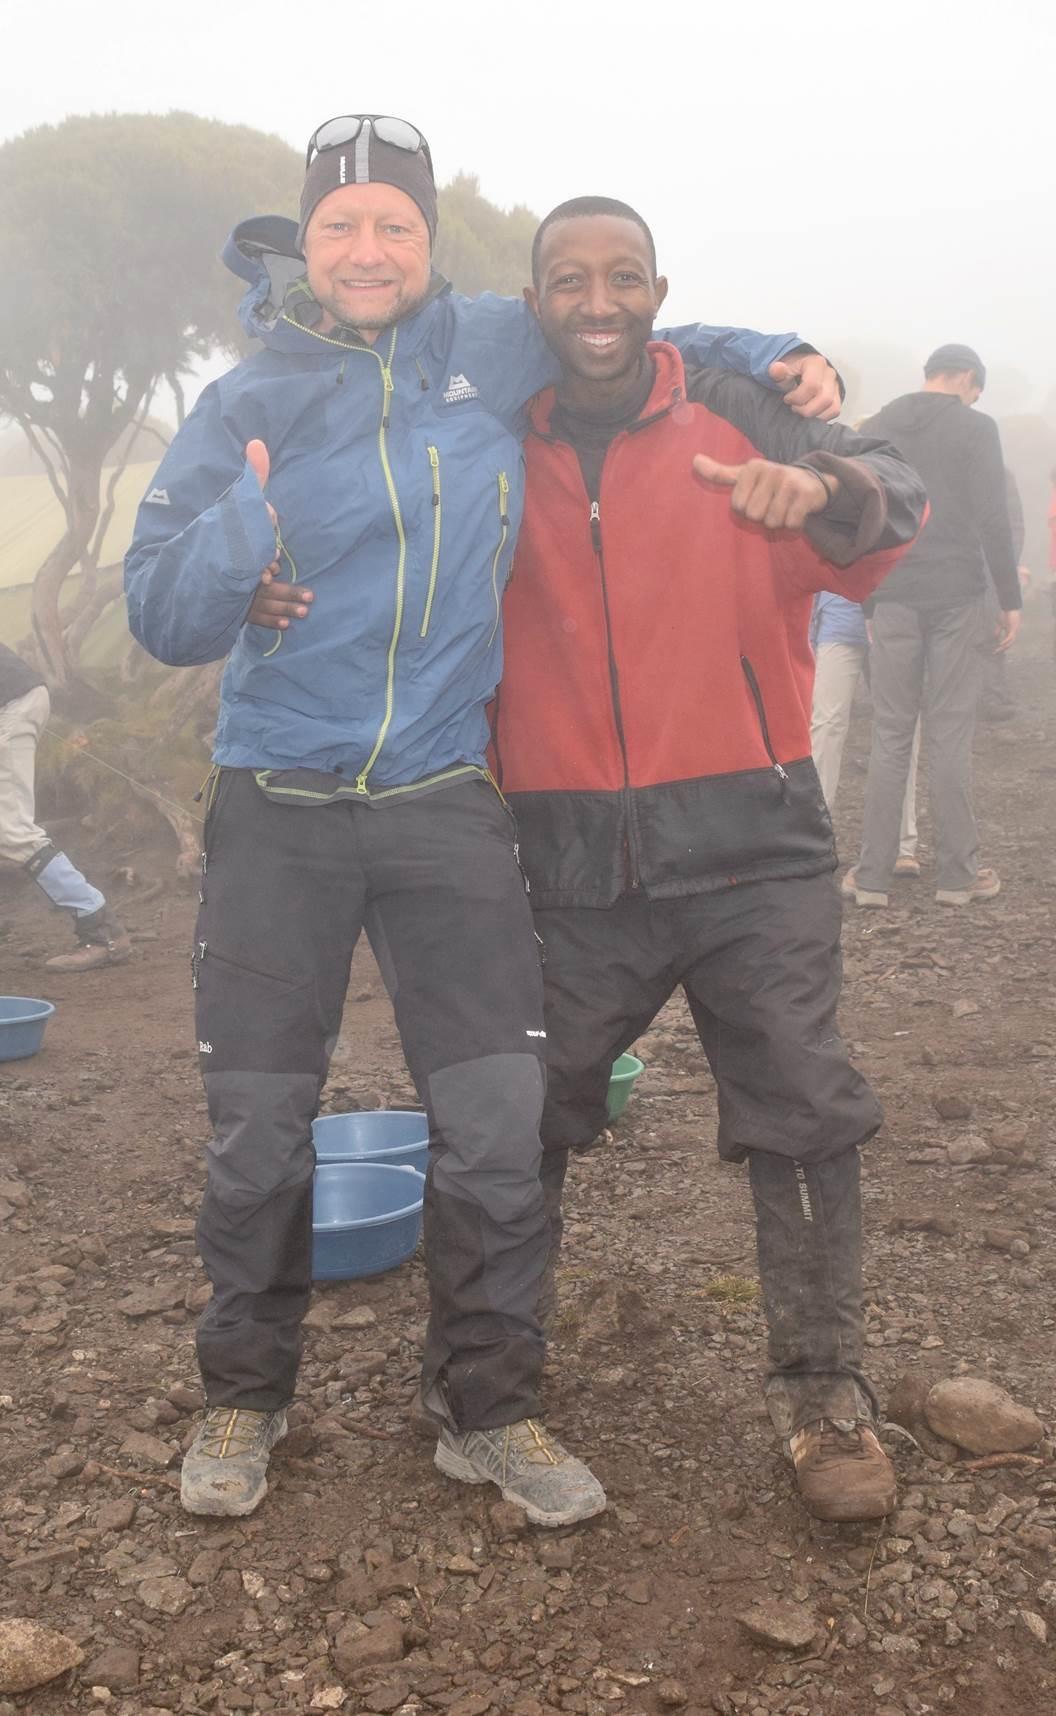 Mount-Kilimanjaro-Chris-Foster